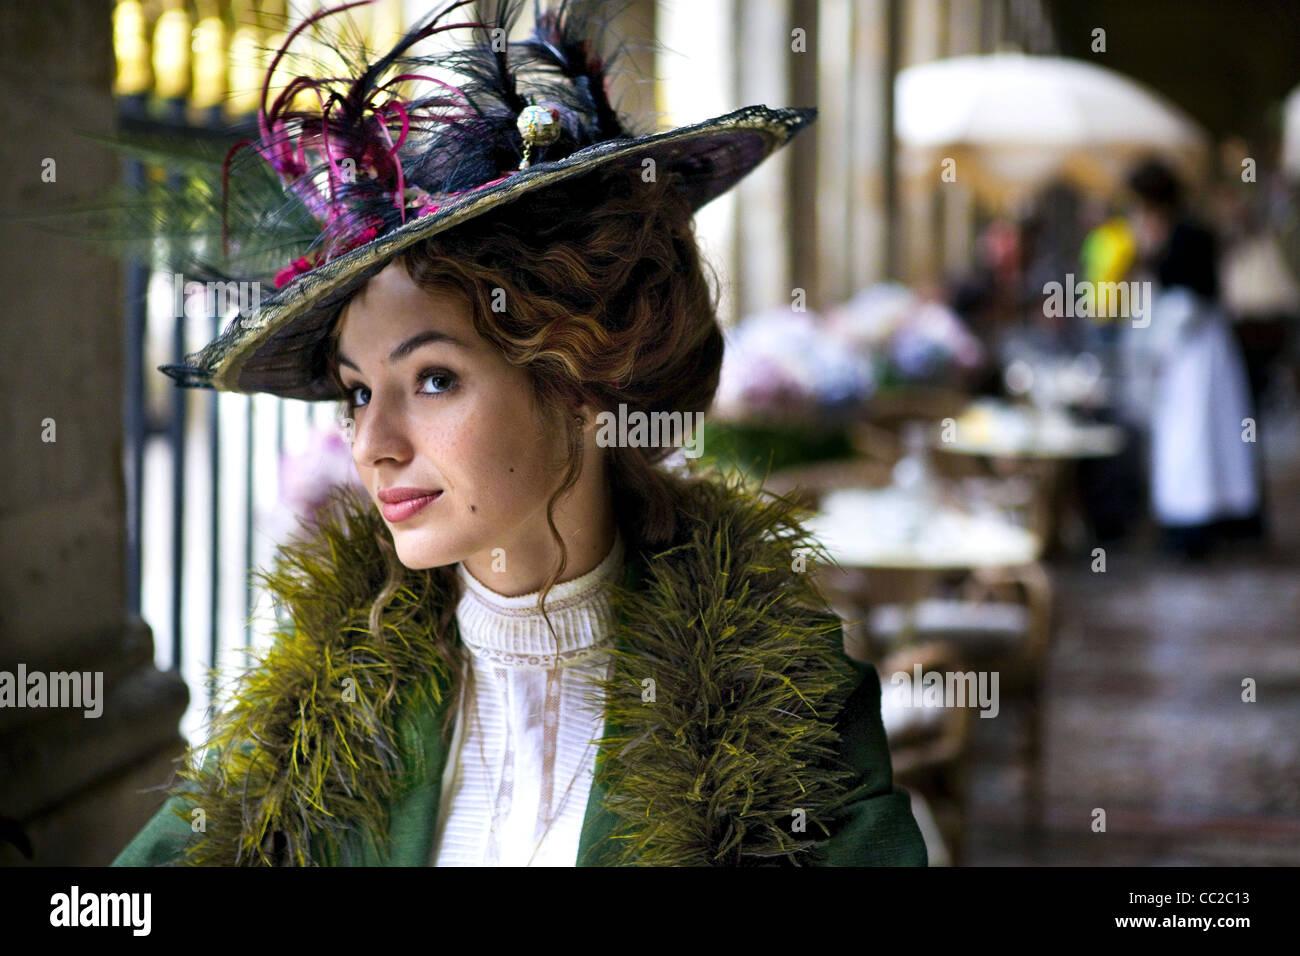 LOUISE BOURGOIN LES AVENTURES EXTRAORDINAIRES D'Adèle Blanc-sec; les aventures extraordinaires d'Adèle Photo Stock